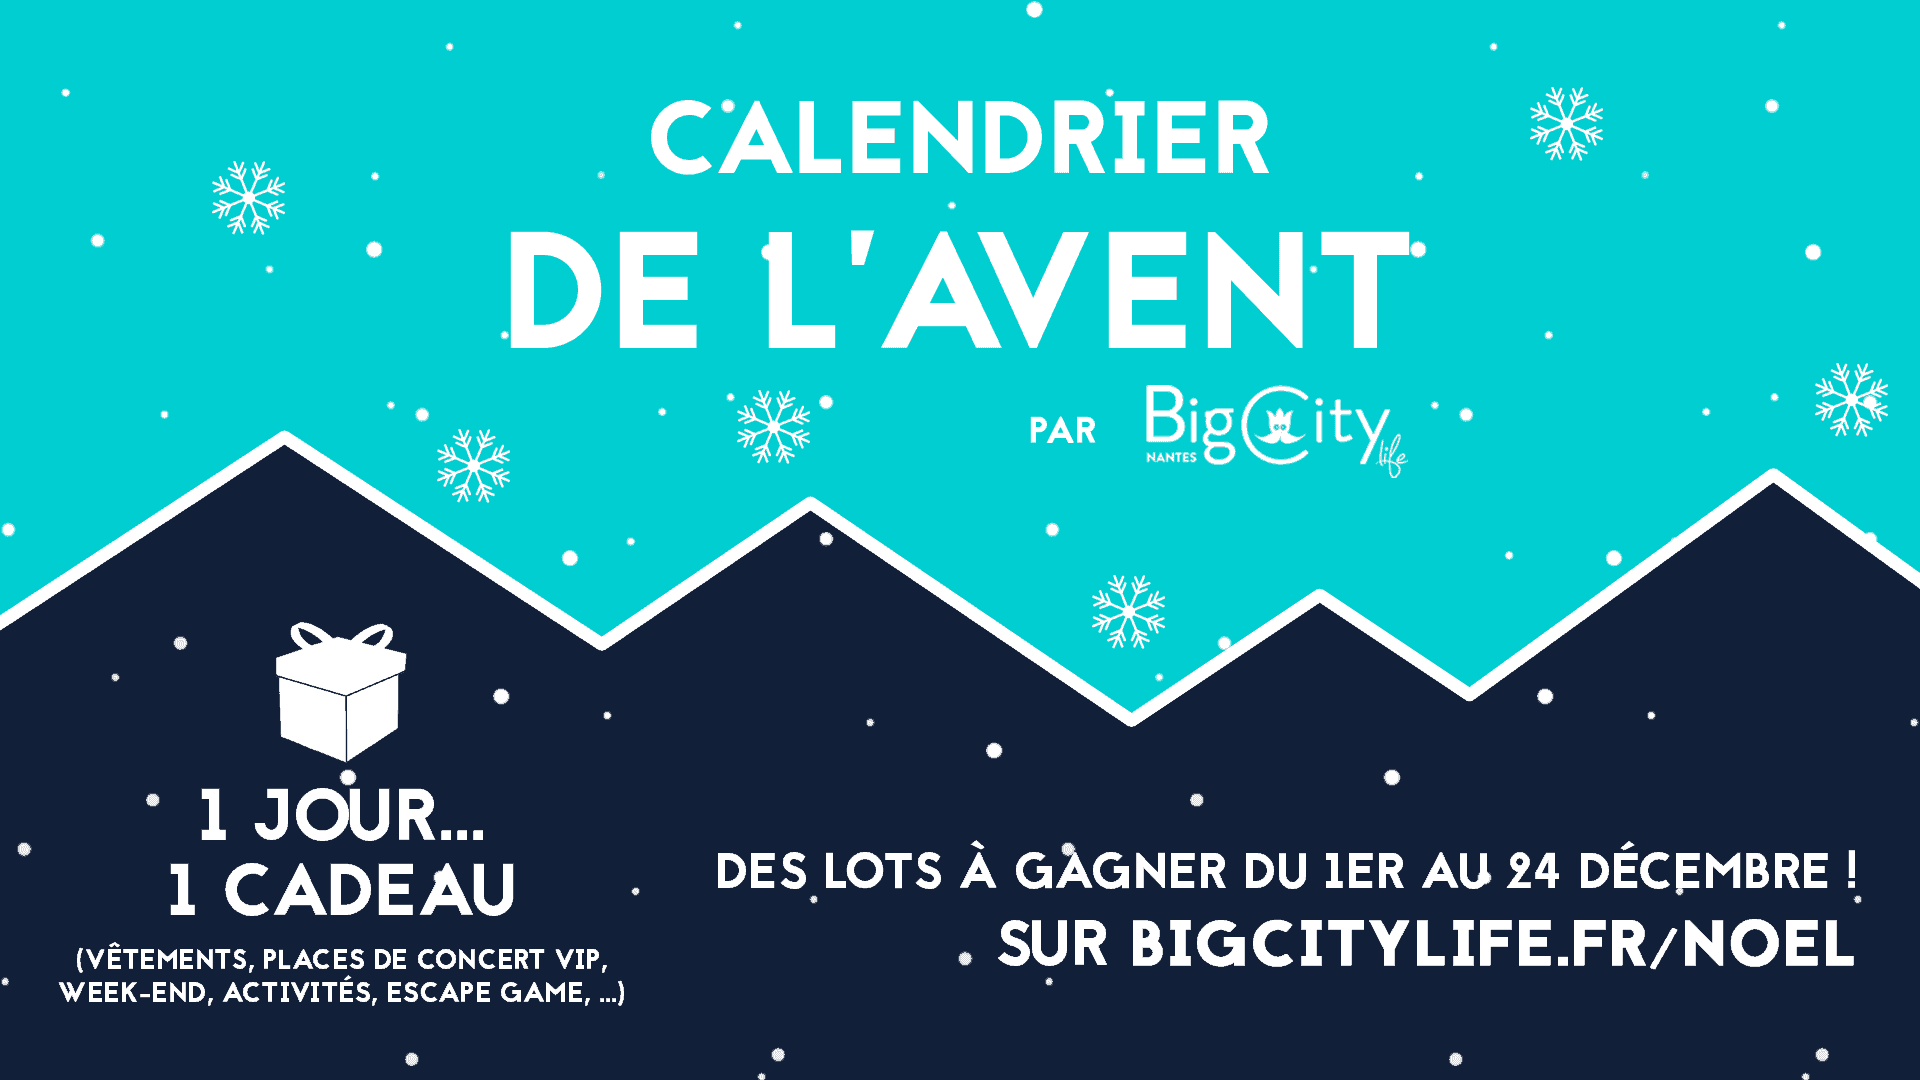 calendrier de lavent noel 2019